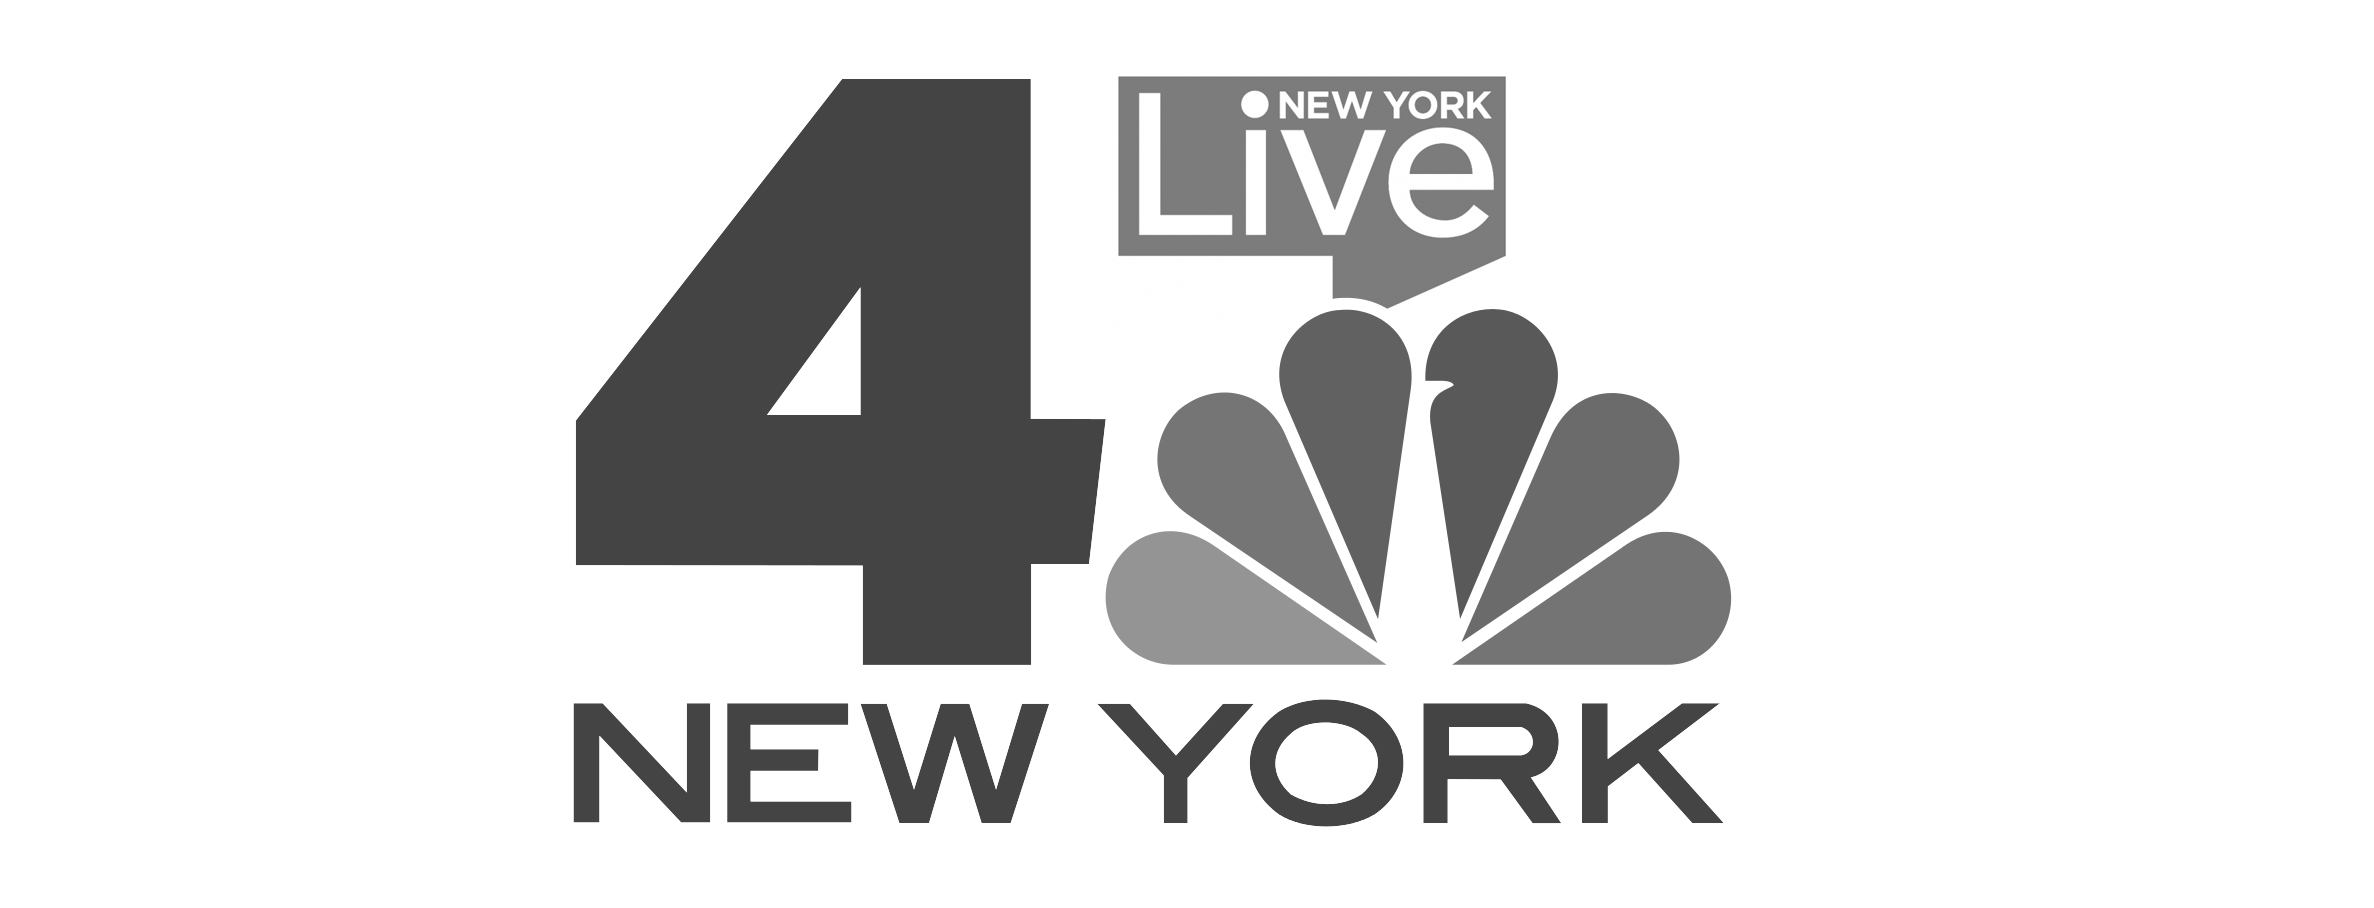 NBC_NY_Live_Unarthodox Logo.jpg